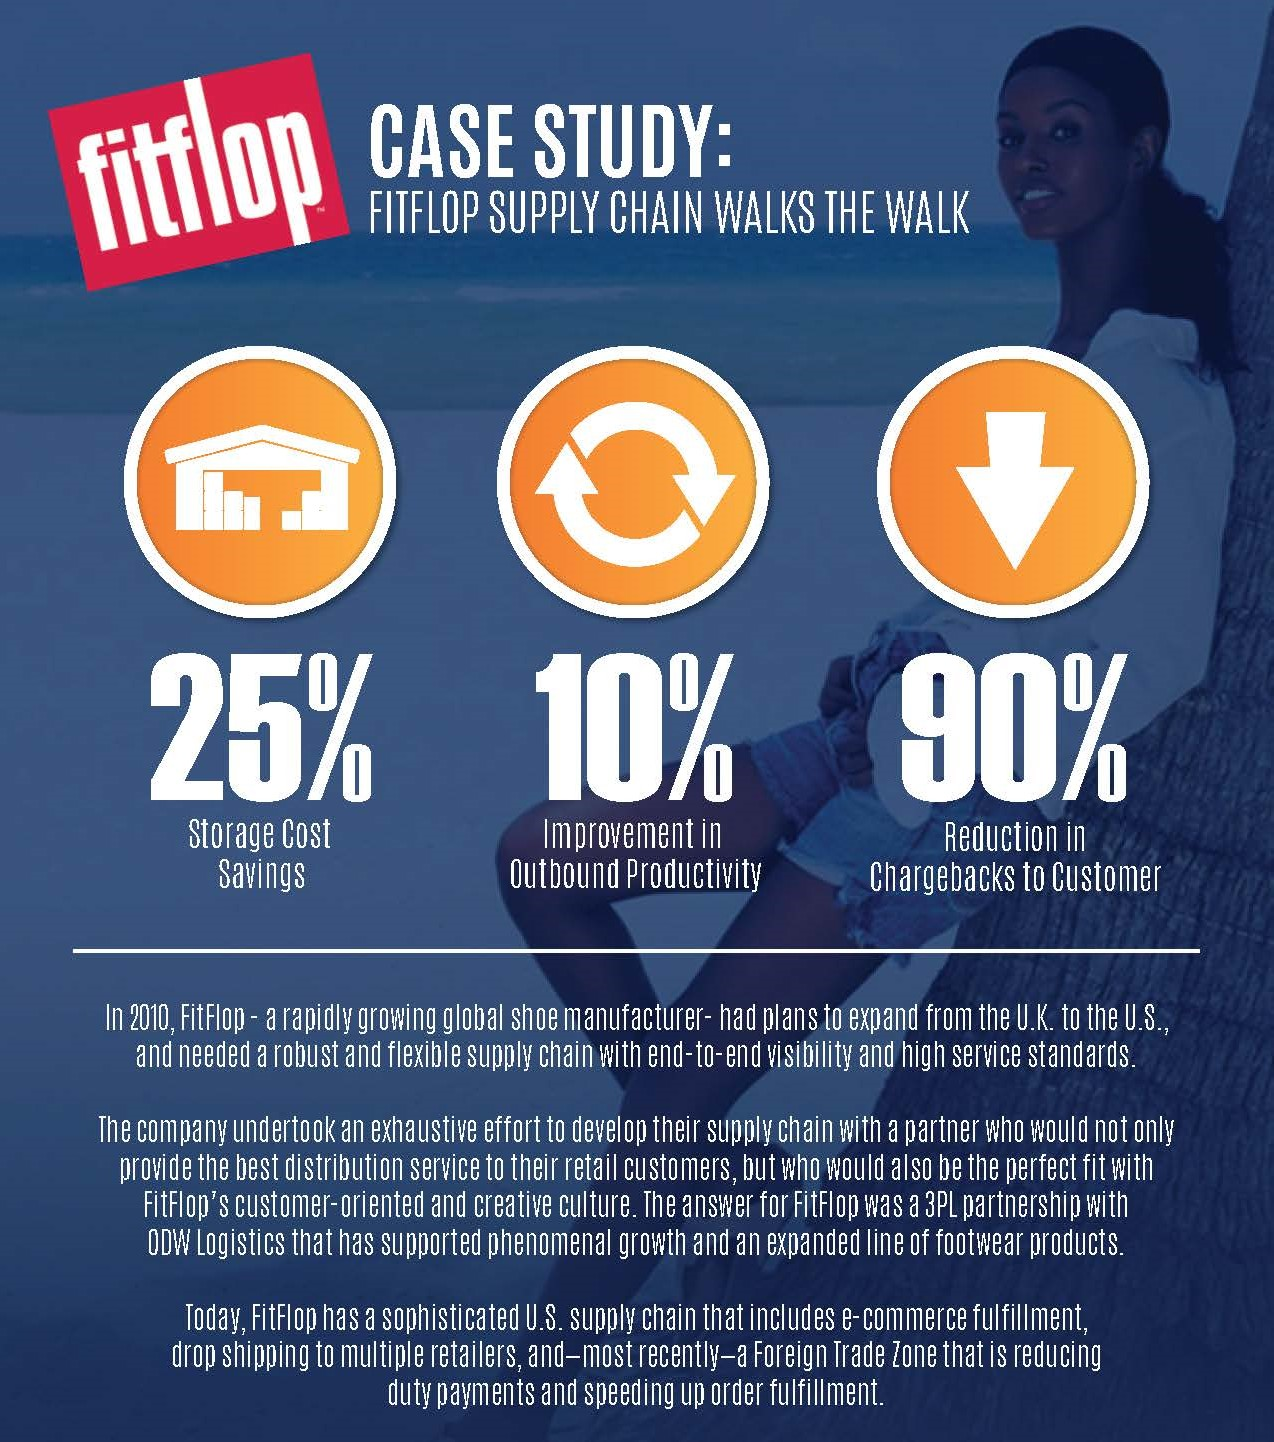 ODW | FitFlop Case Study | ODW Logistics